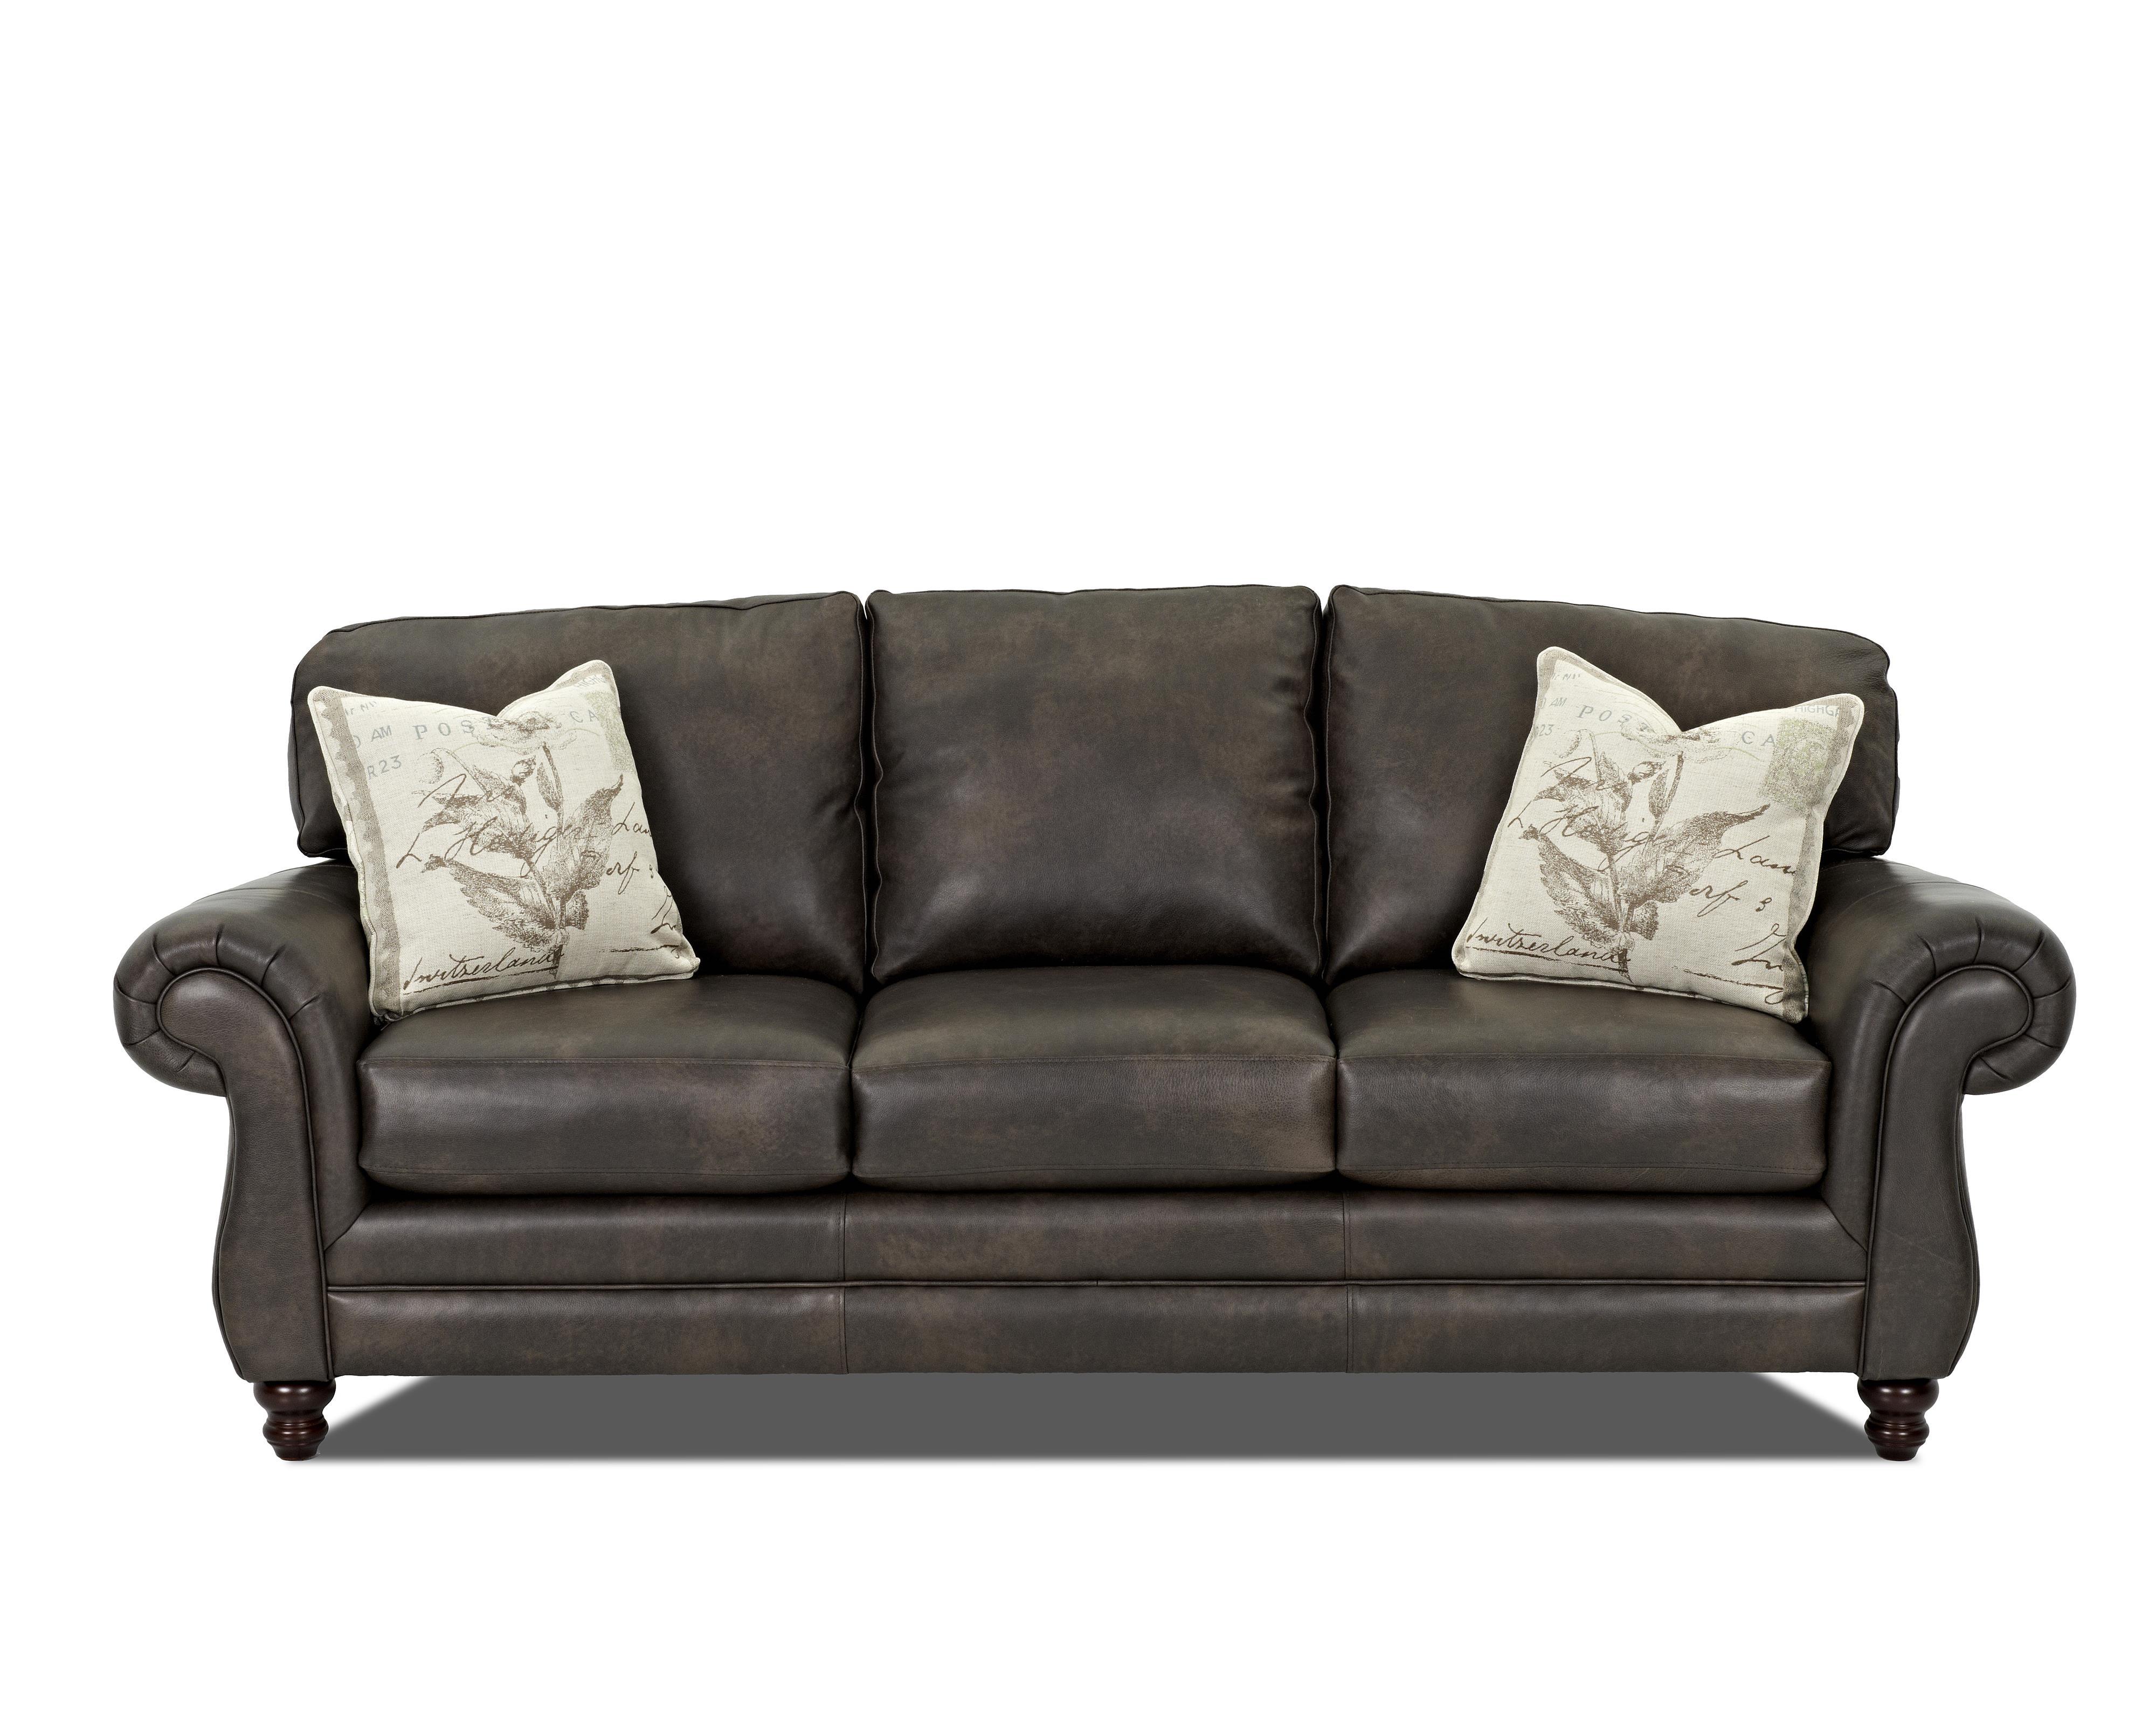 Klaussner Valiant Sofa Item Number Lt56200ap S Vintageflint